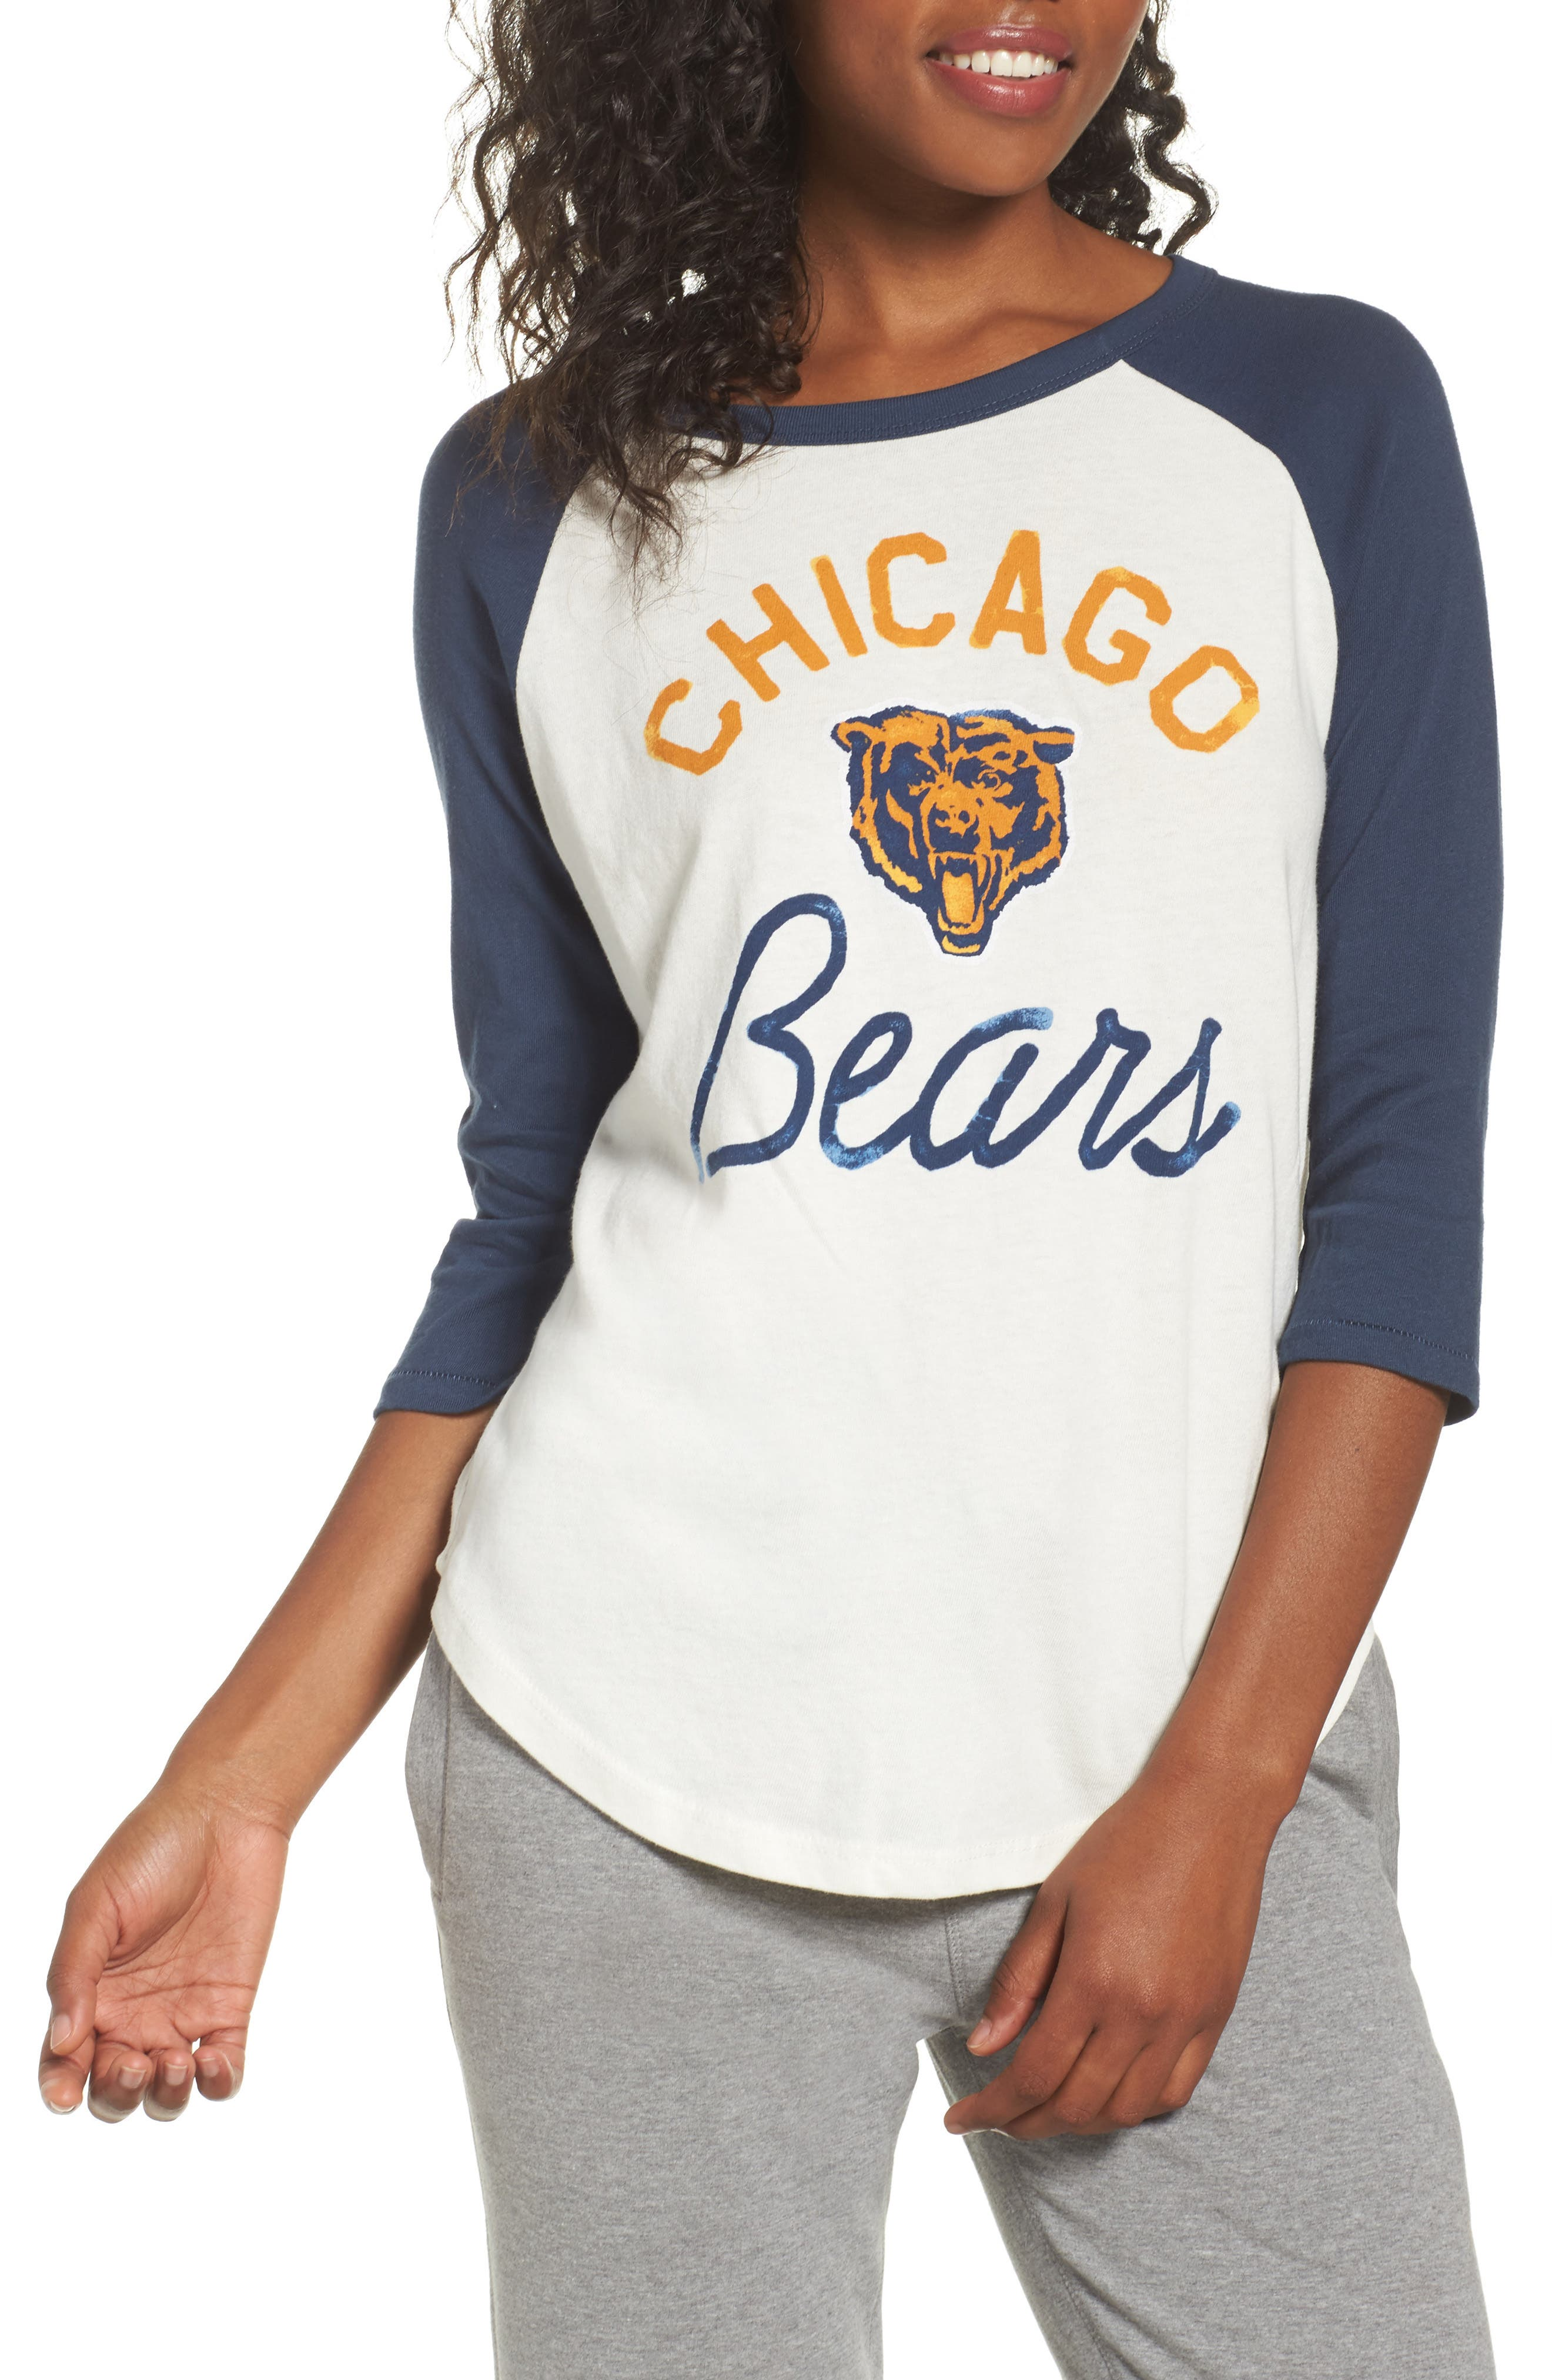 NFL Chicago Bears Raglan Tee,                             Main thumbnail 1, color,                             Sugar/ True Navy